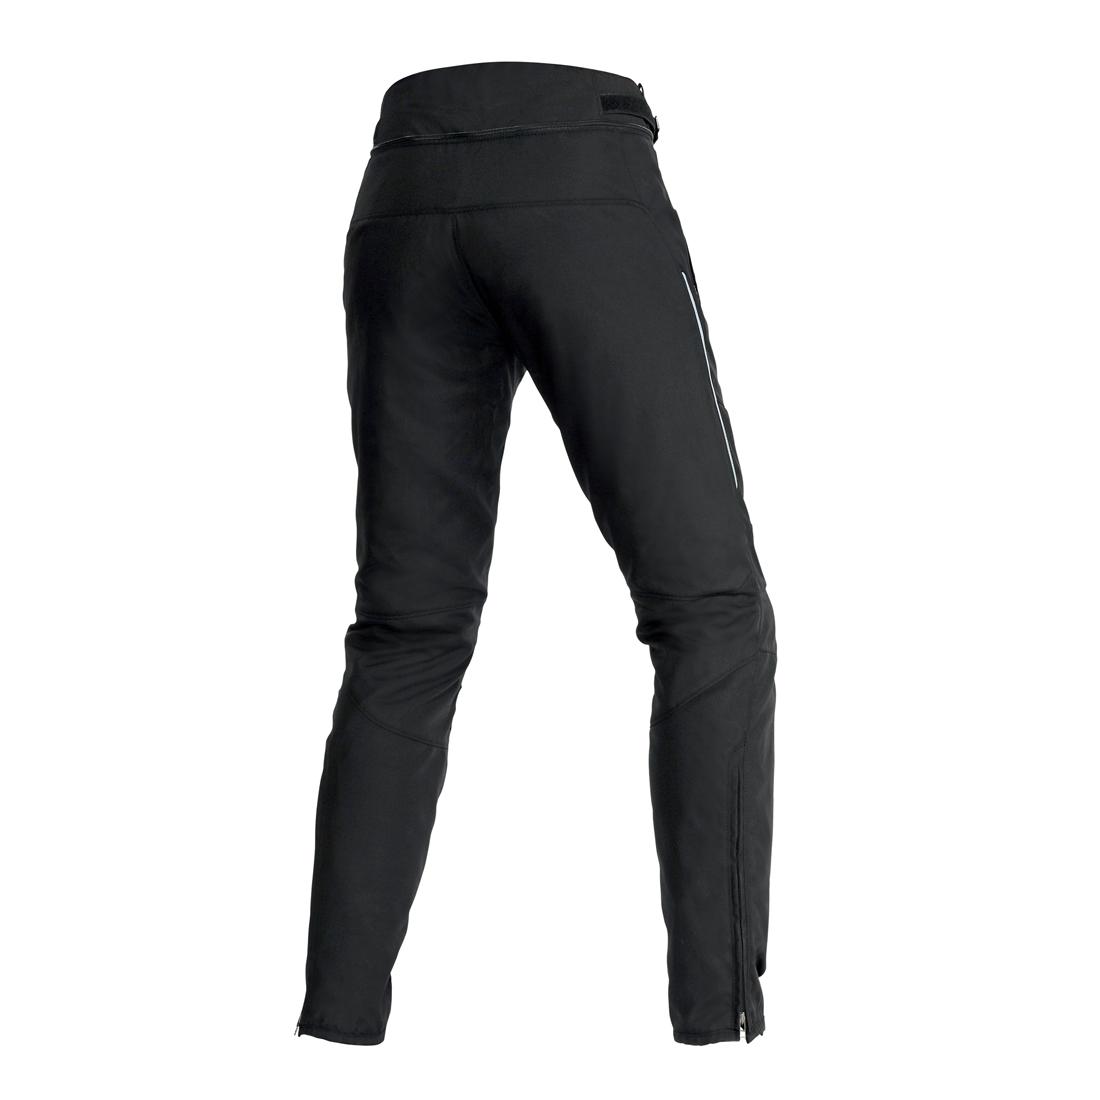 【DAINESE】TEMPEST D-DRY 車褲 - 「Webike-摩托百貨」